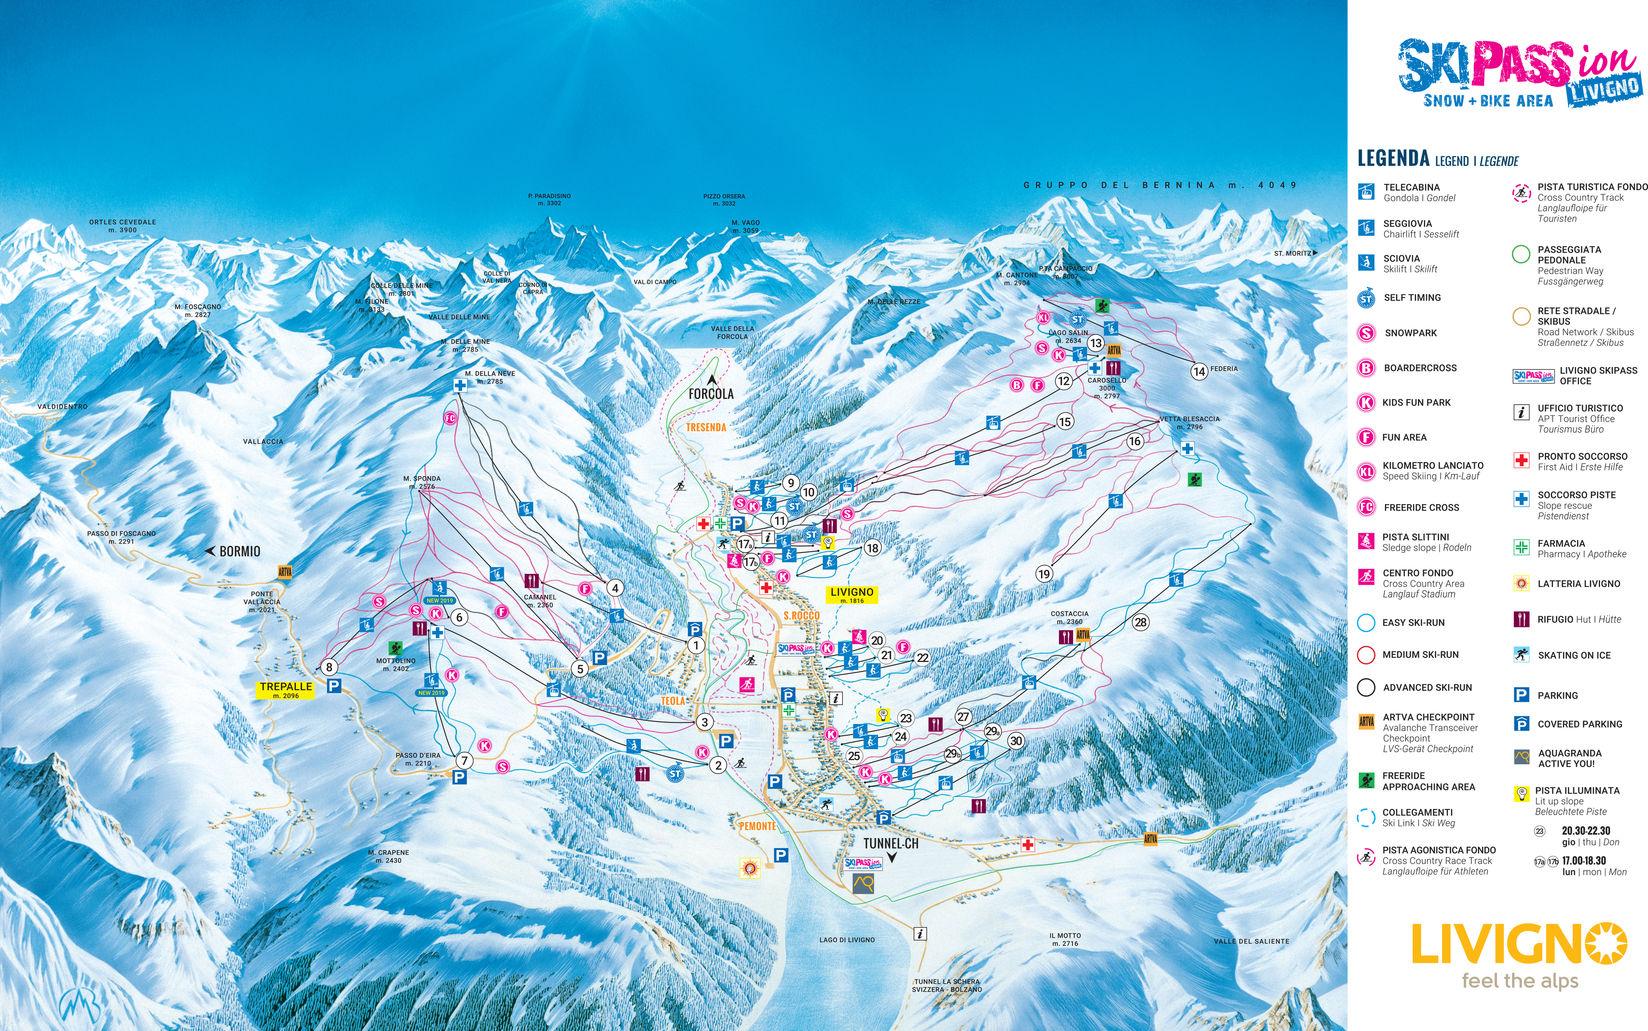 livigno karte italien BERGFEX: Pistenplan Livigno   Panoramakarte Livigno   Karte Livigno